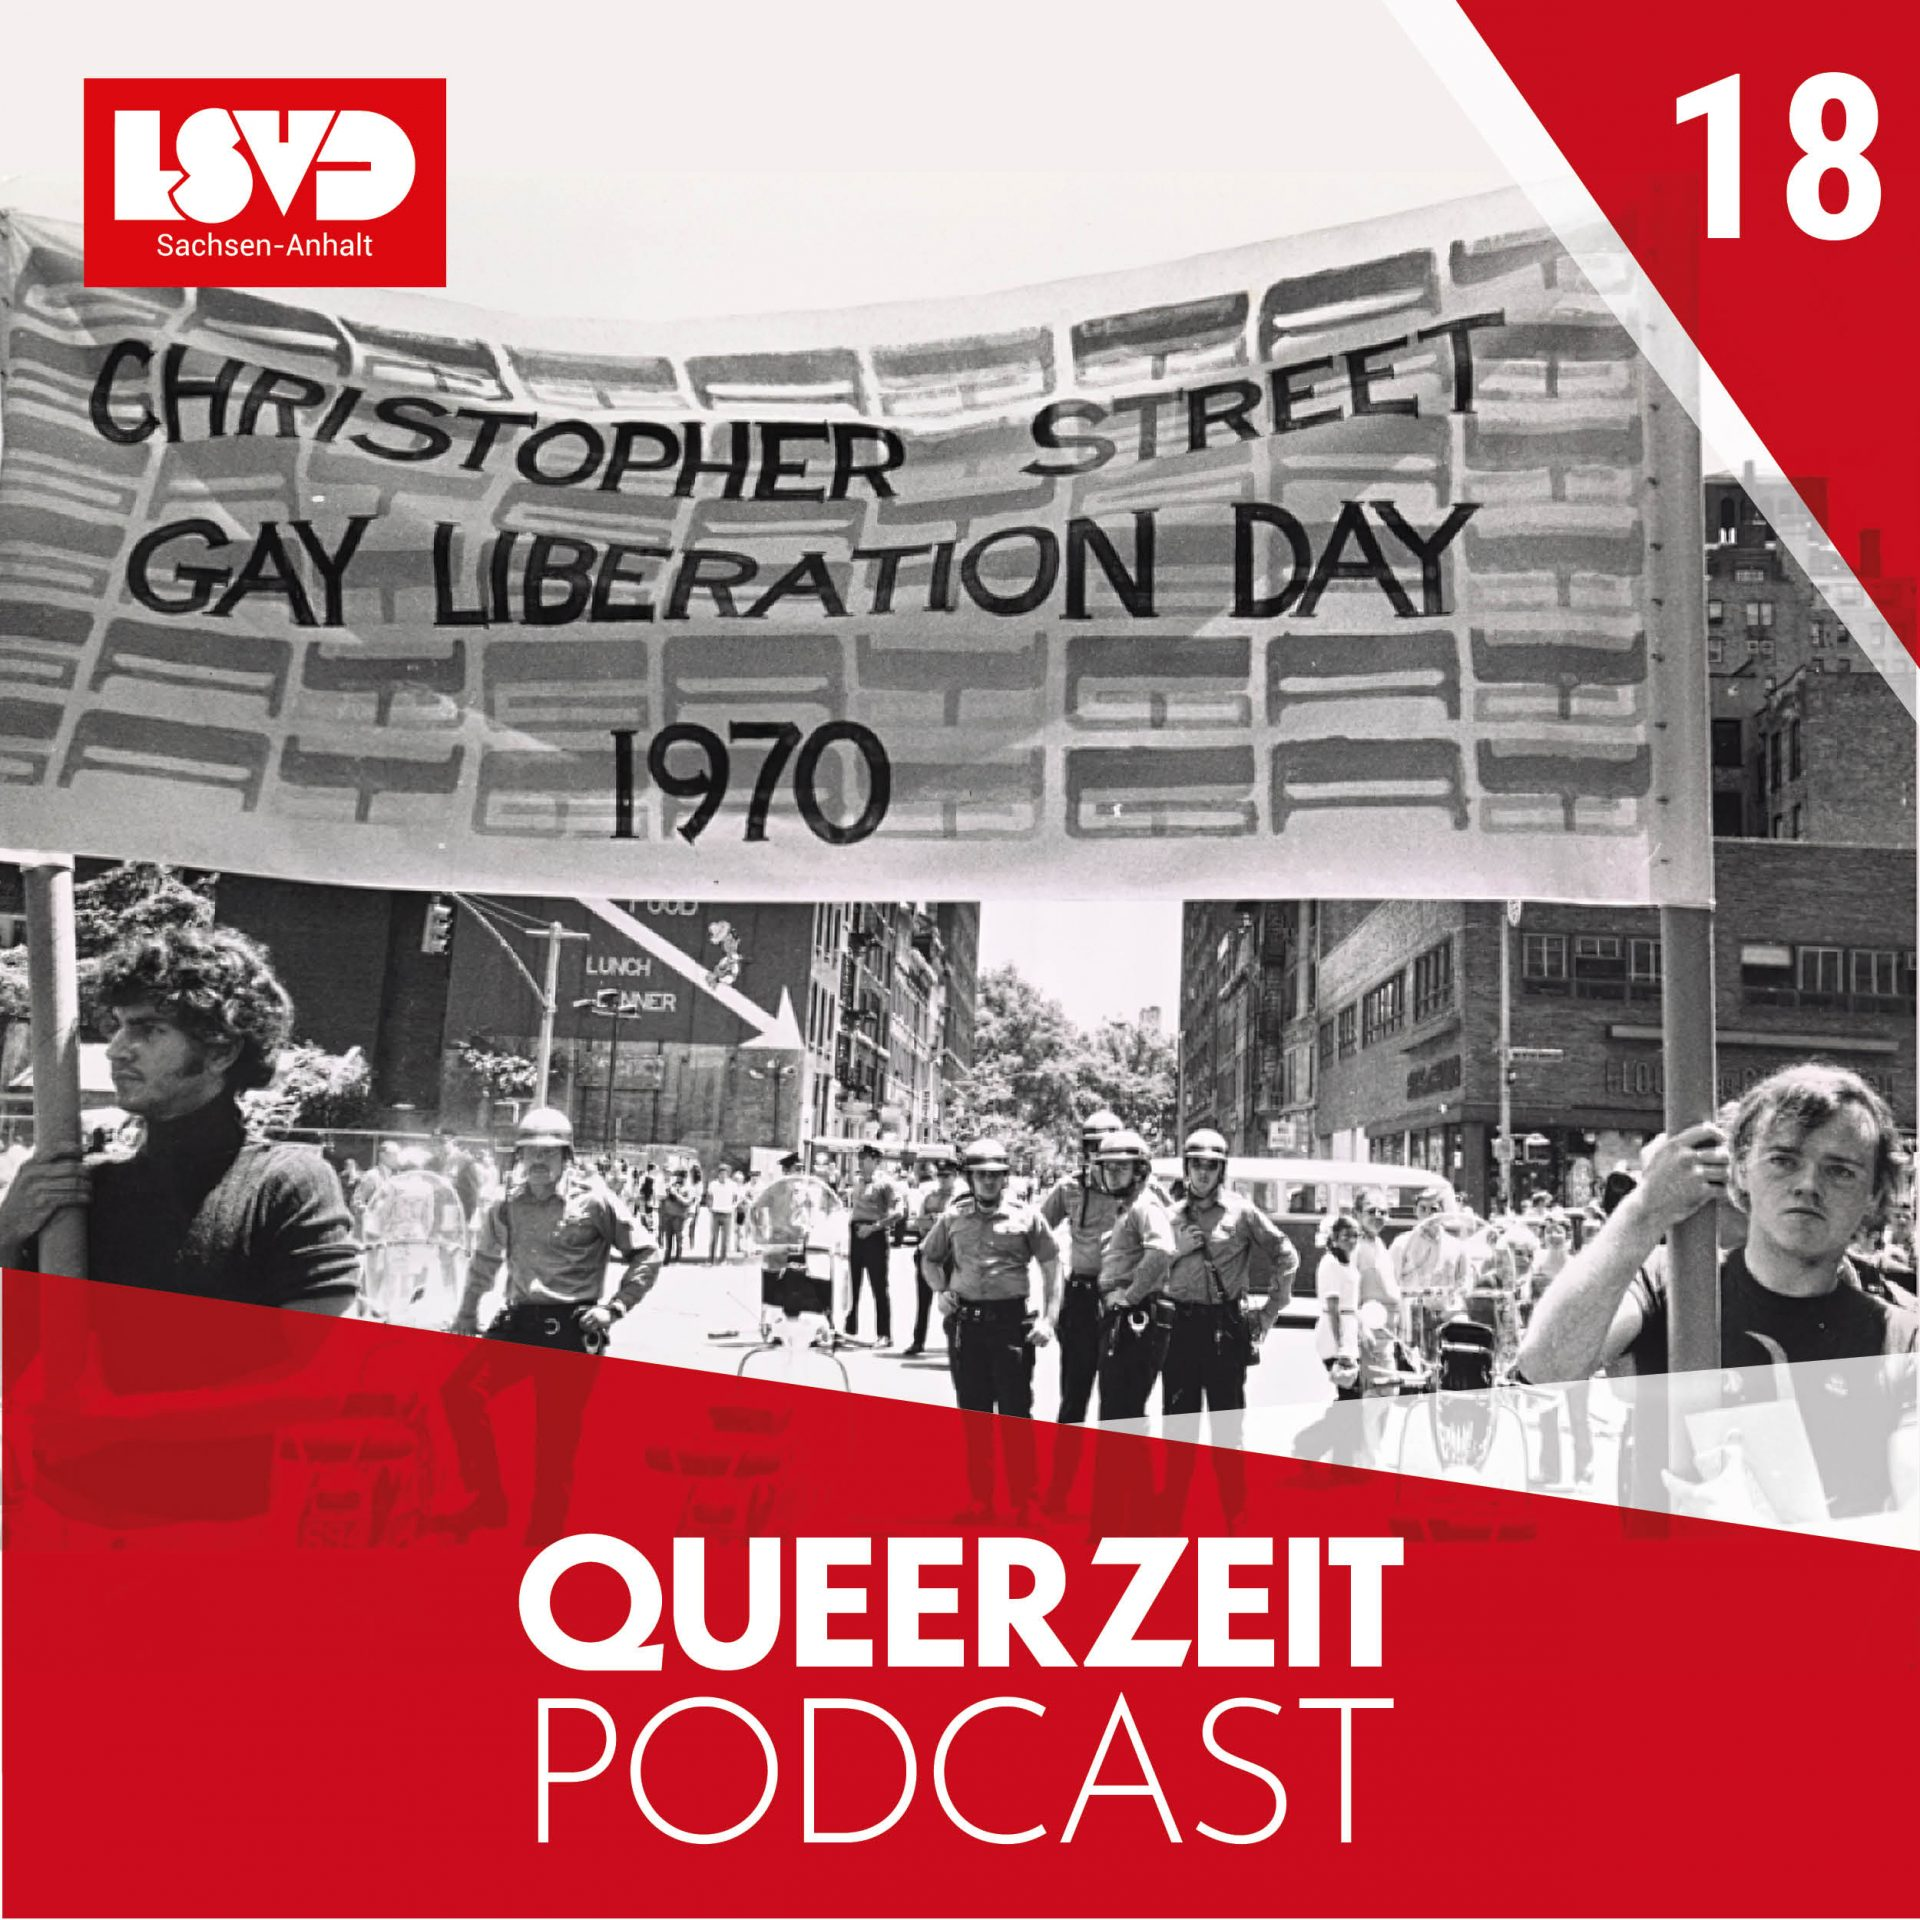 Queerzeit #18 – Gay Liberation Day March